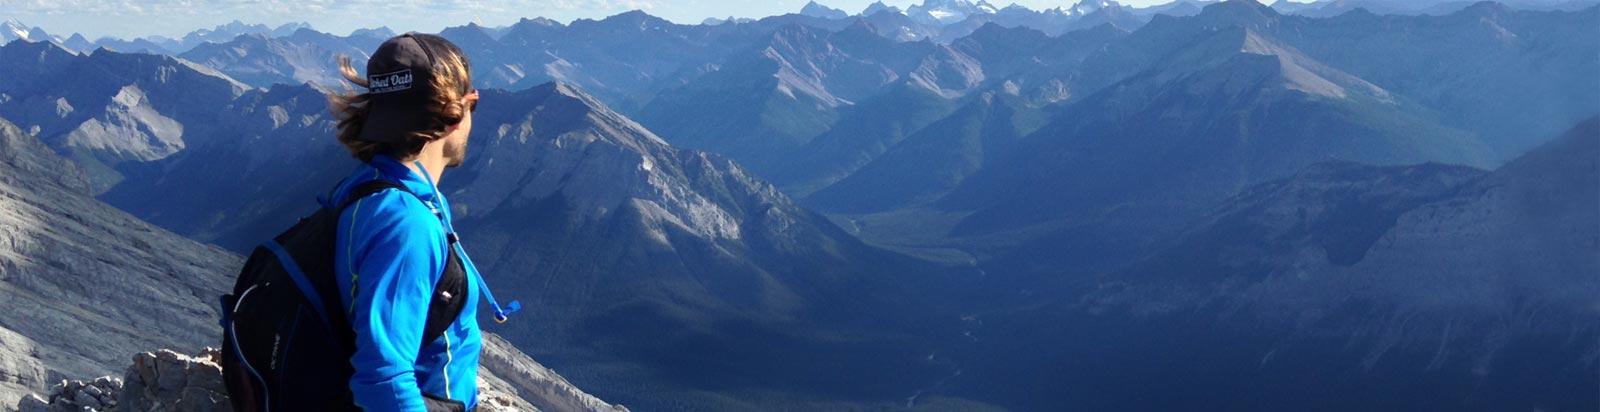 Merrell ambassador, looking off into a vast mountain vista.